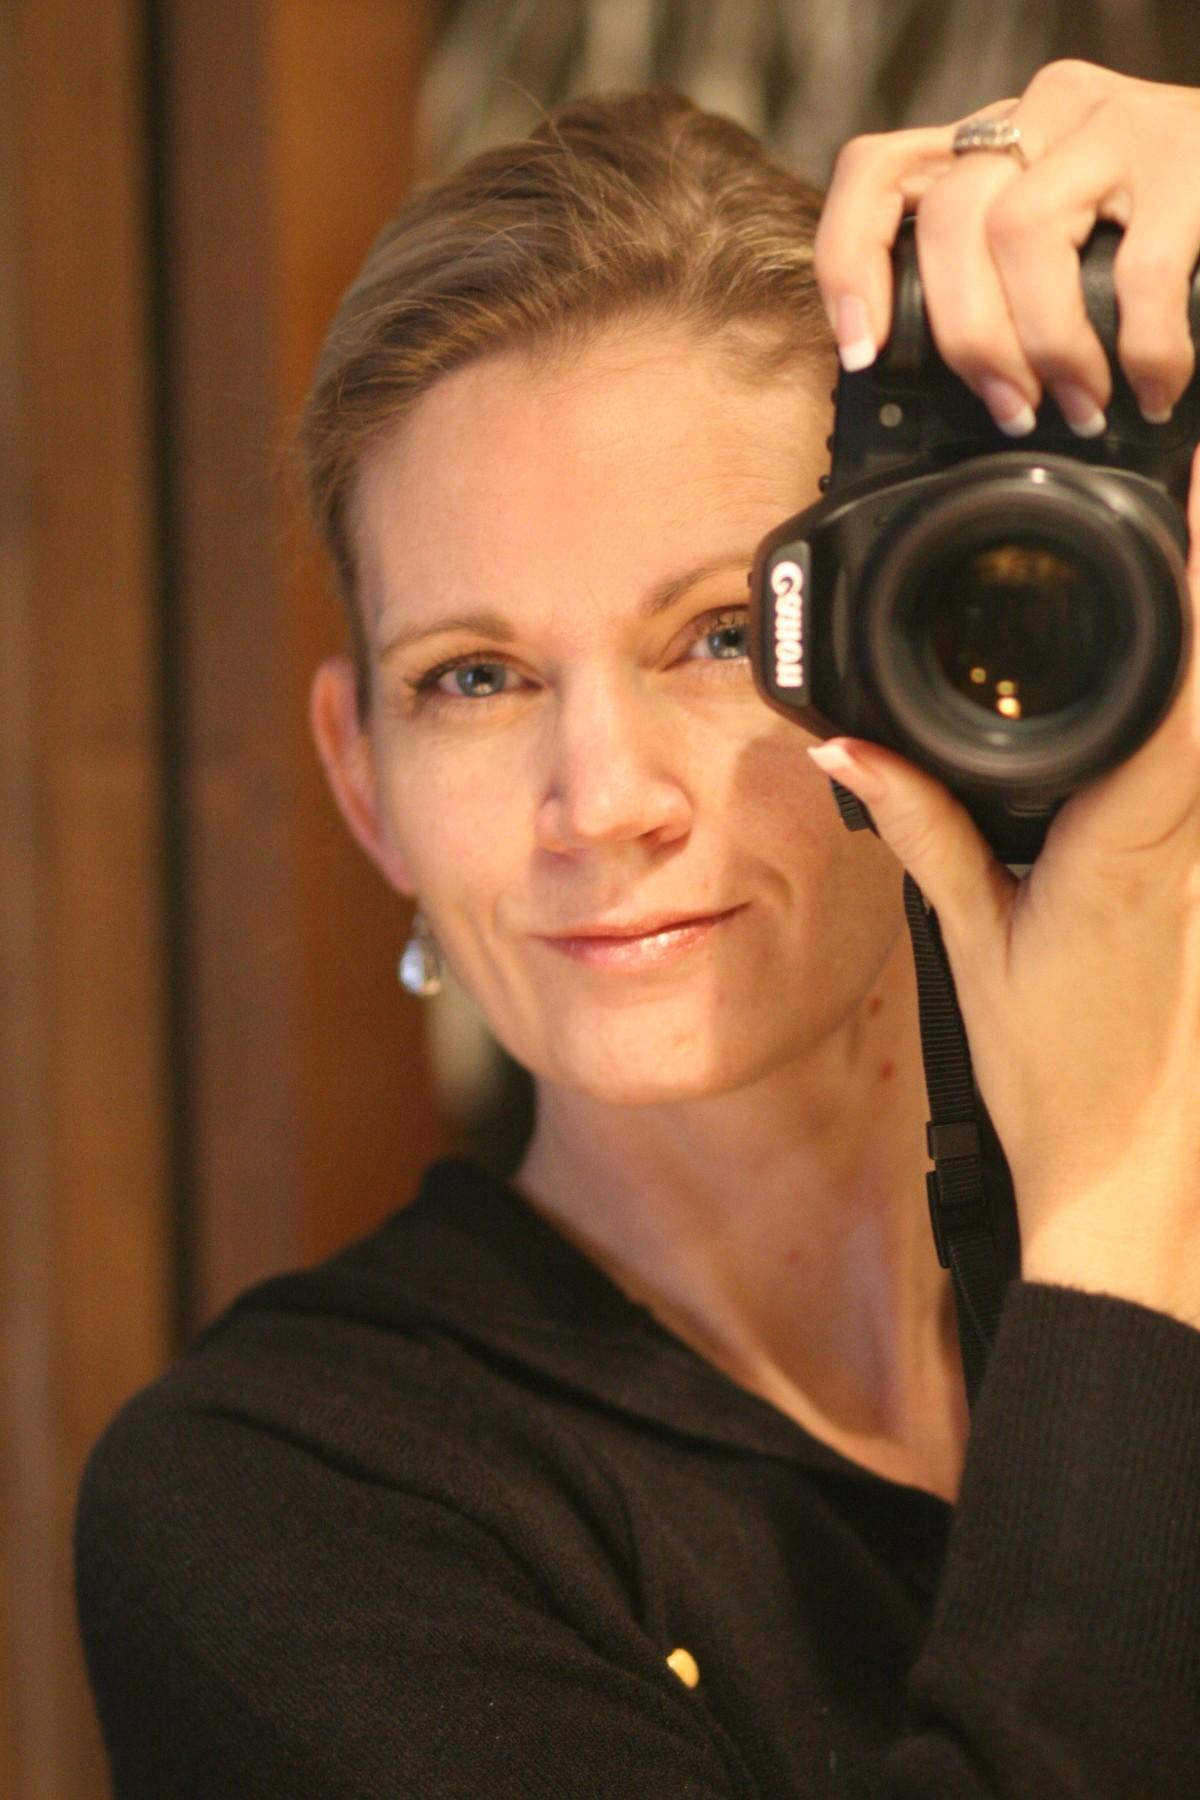 Margo LaPanta Headshot  |  Professional Photographer in Shoreview, Minnesota